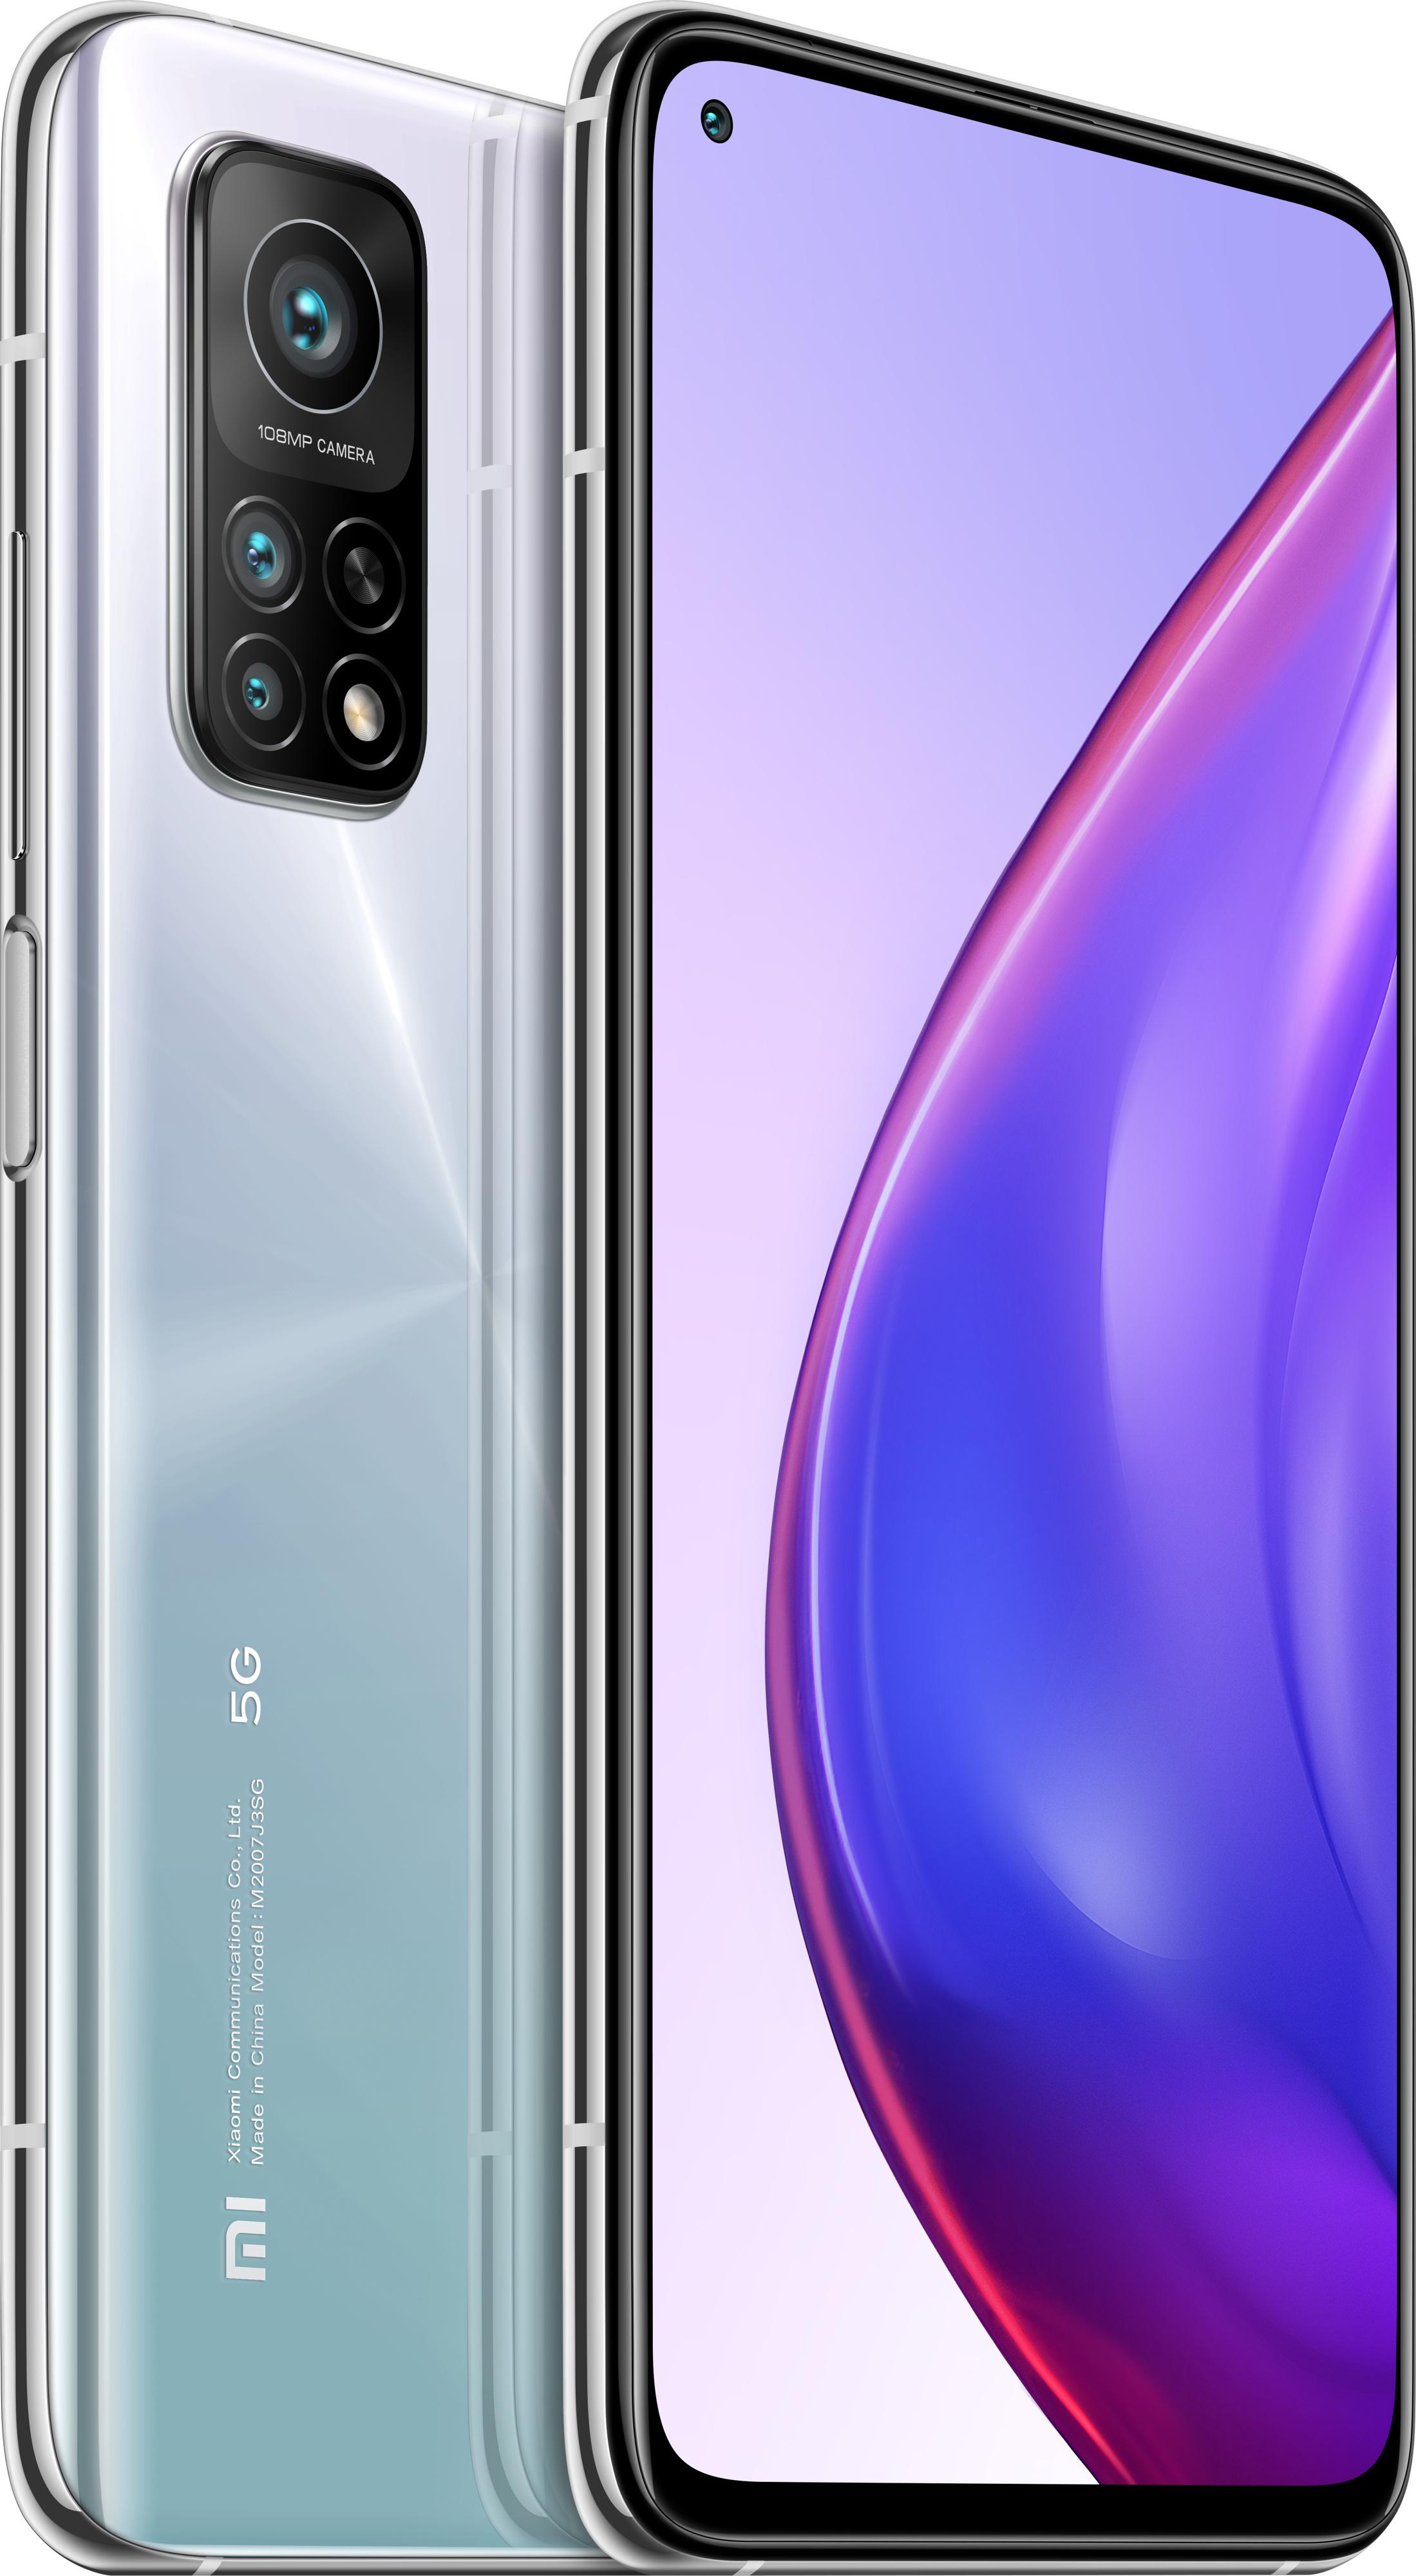 Xiaomi Mi 10T Pro -Android-puhelin, 256 Gt, Aurora Blue – Android – Puhelimet – Puhelimet – Verkkokauppa.com